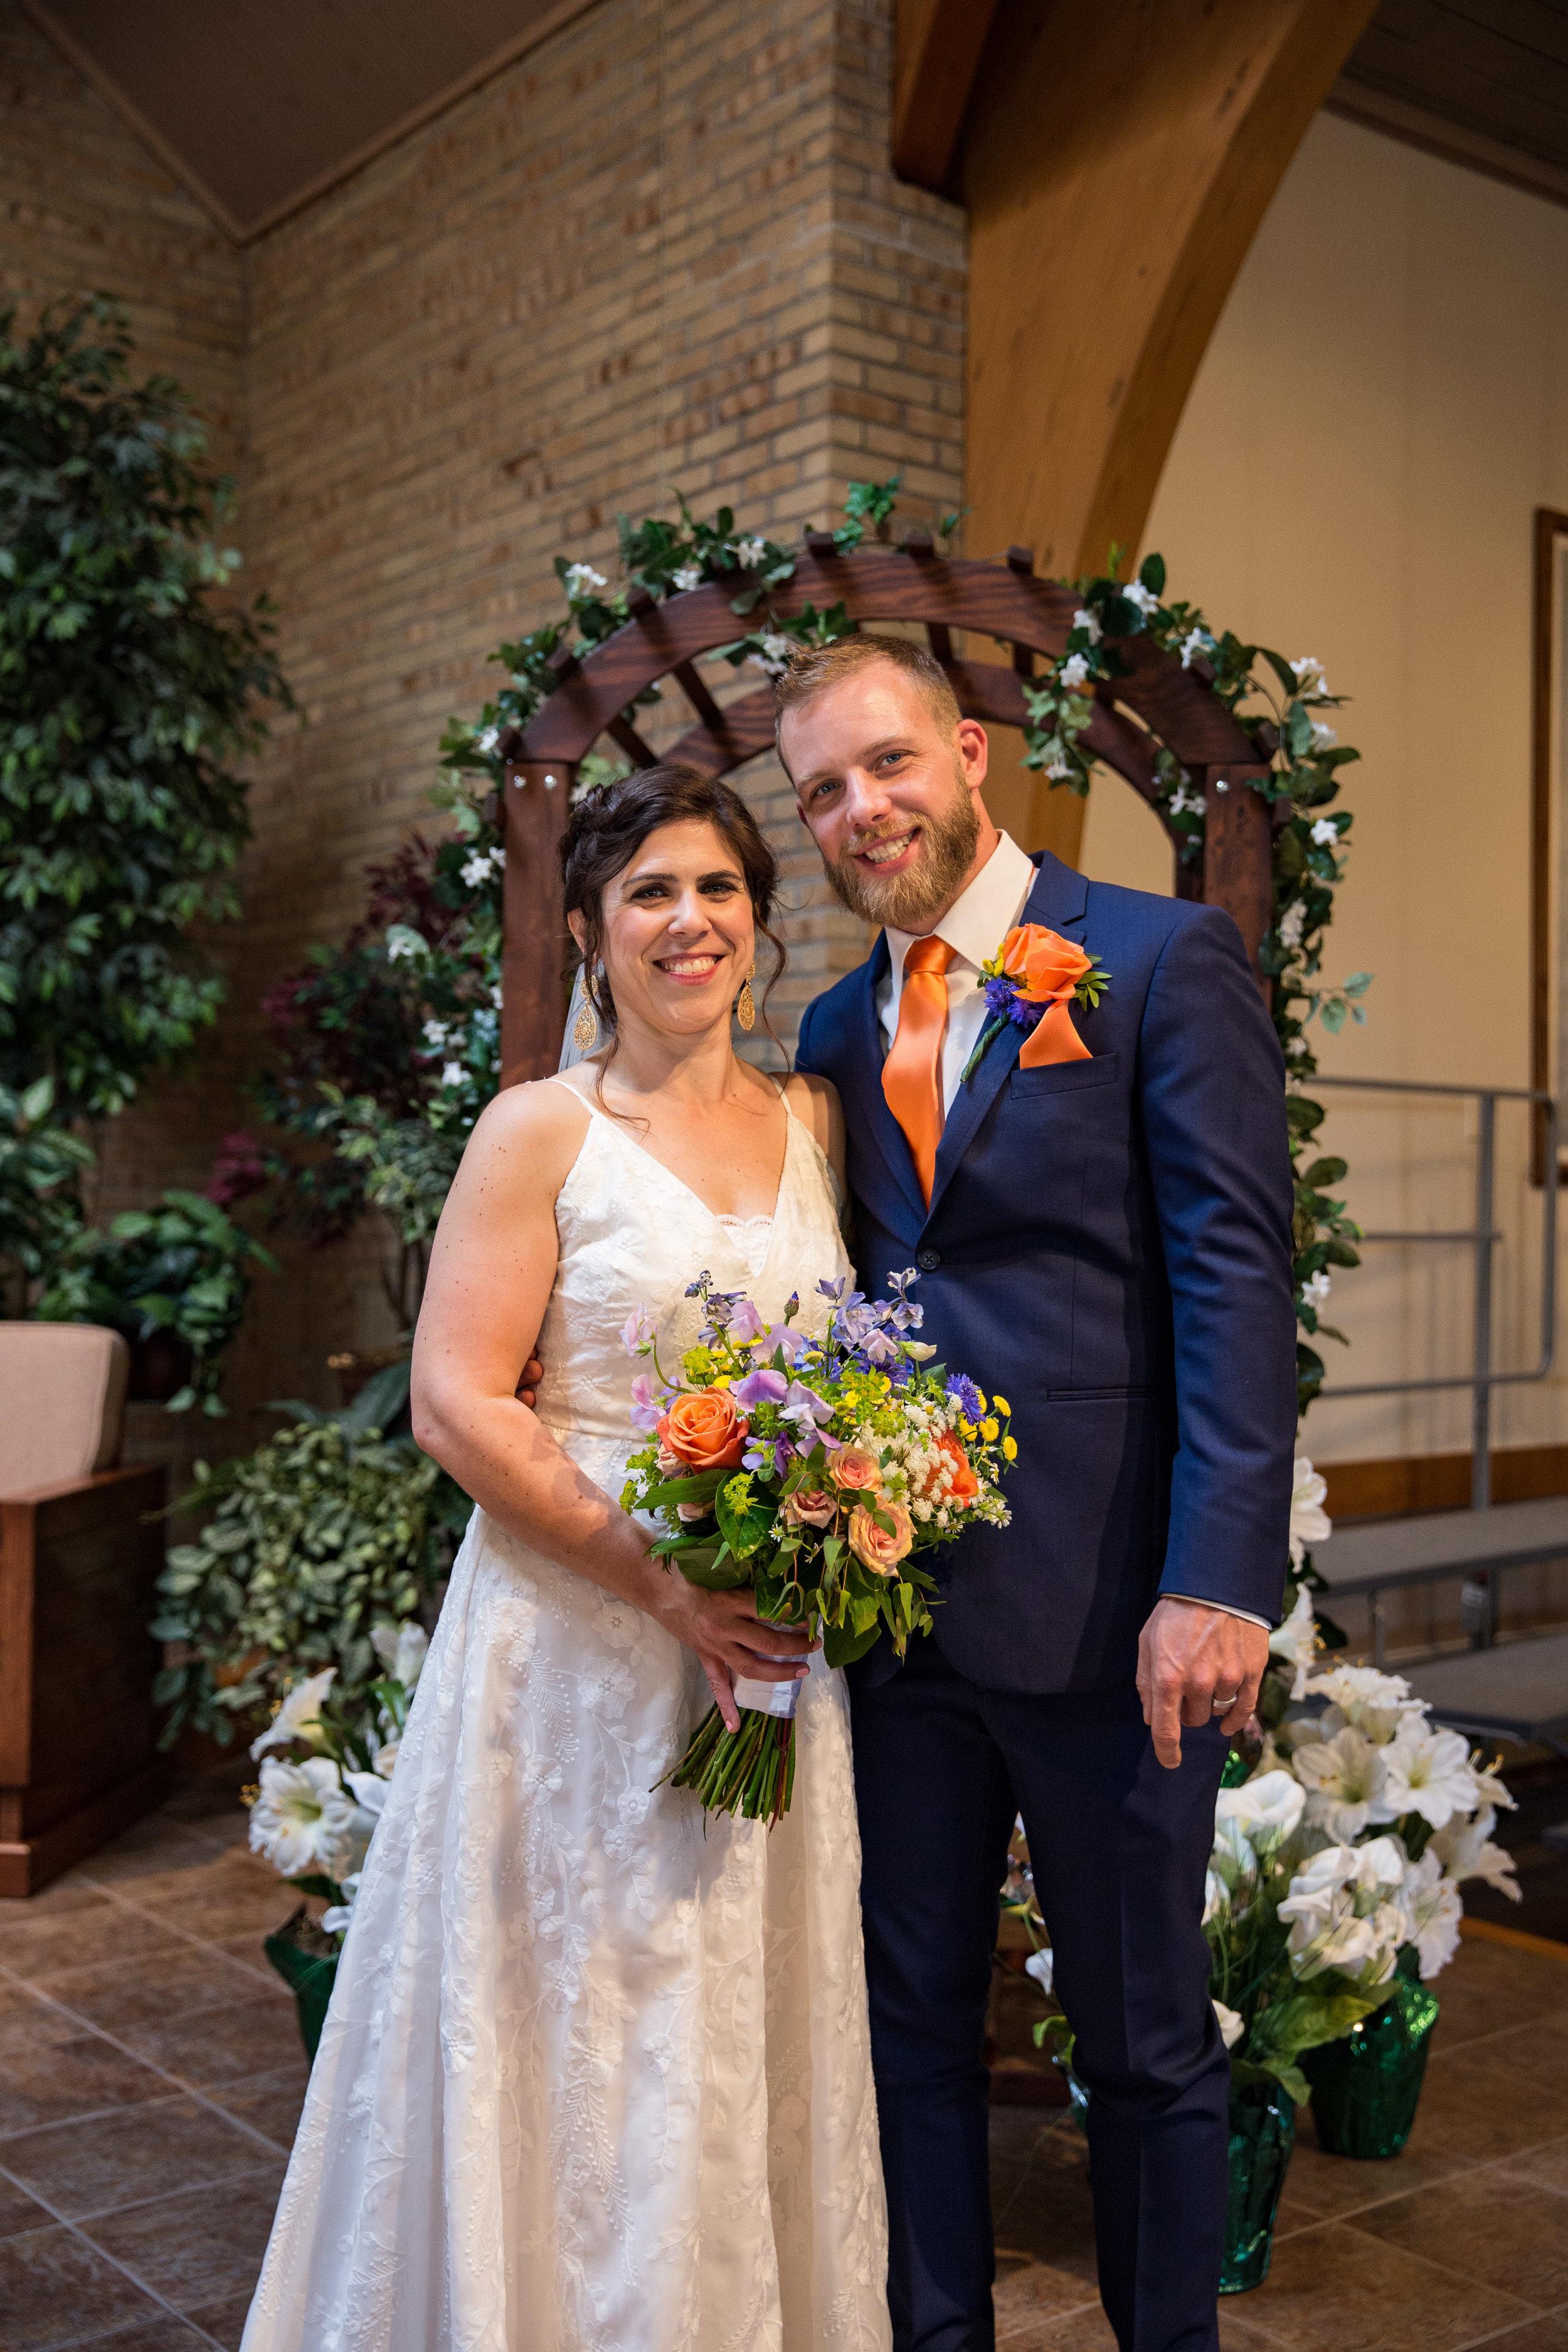 Natalie and Dallas Mooney Wedding 6-8-19_Tania Watt Photography-212.jpg